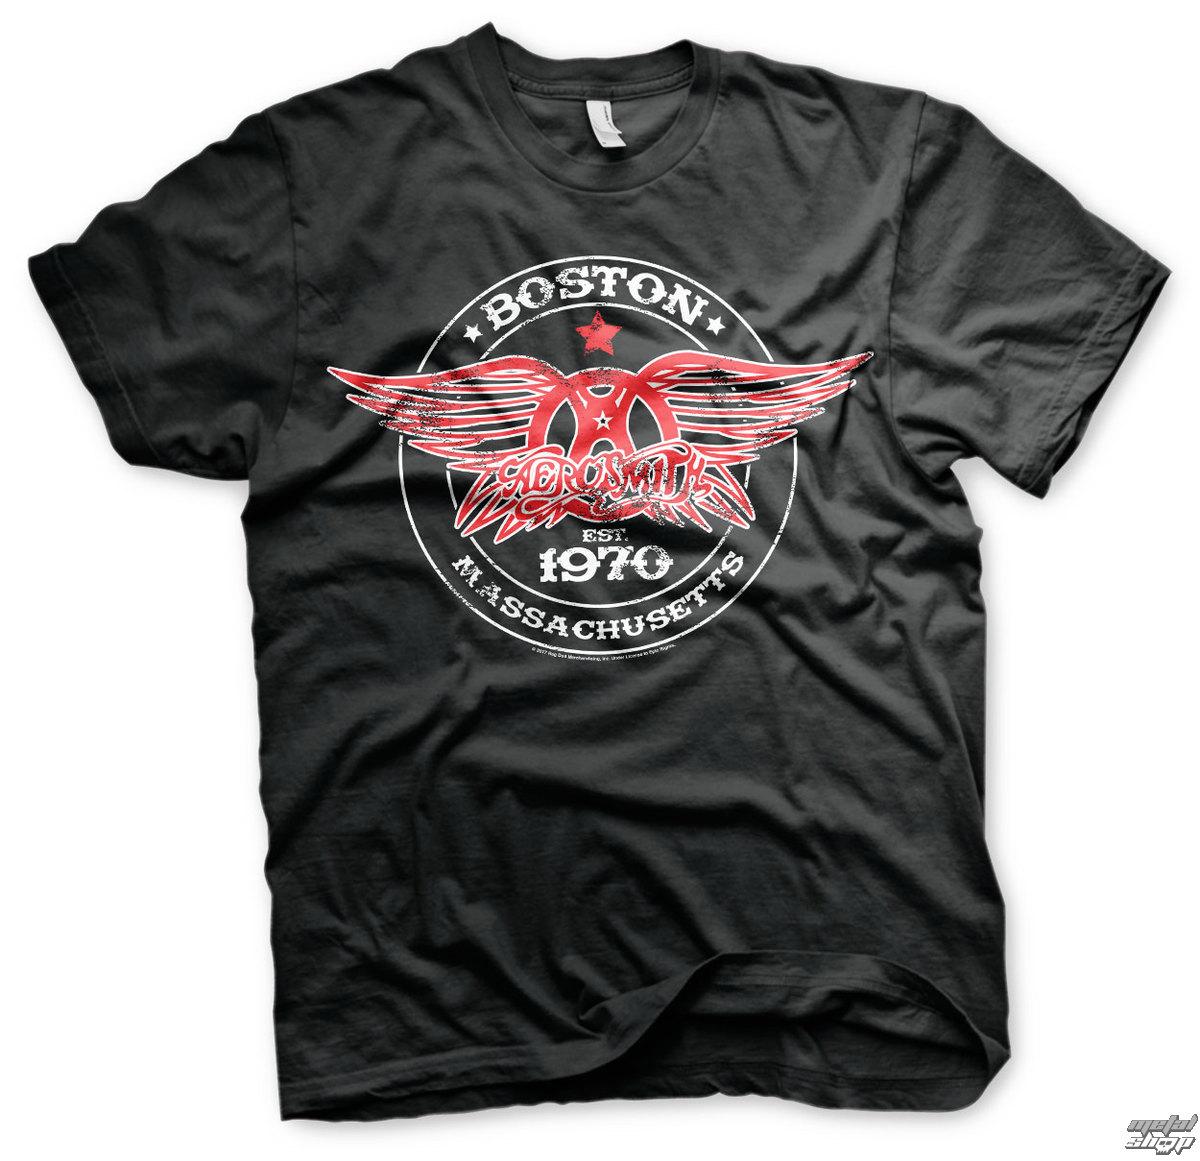 tričko pánské Aerosmith - Est. 1970, Boston - Black - HYBRIS